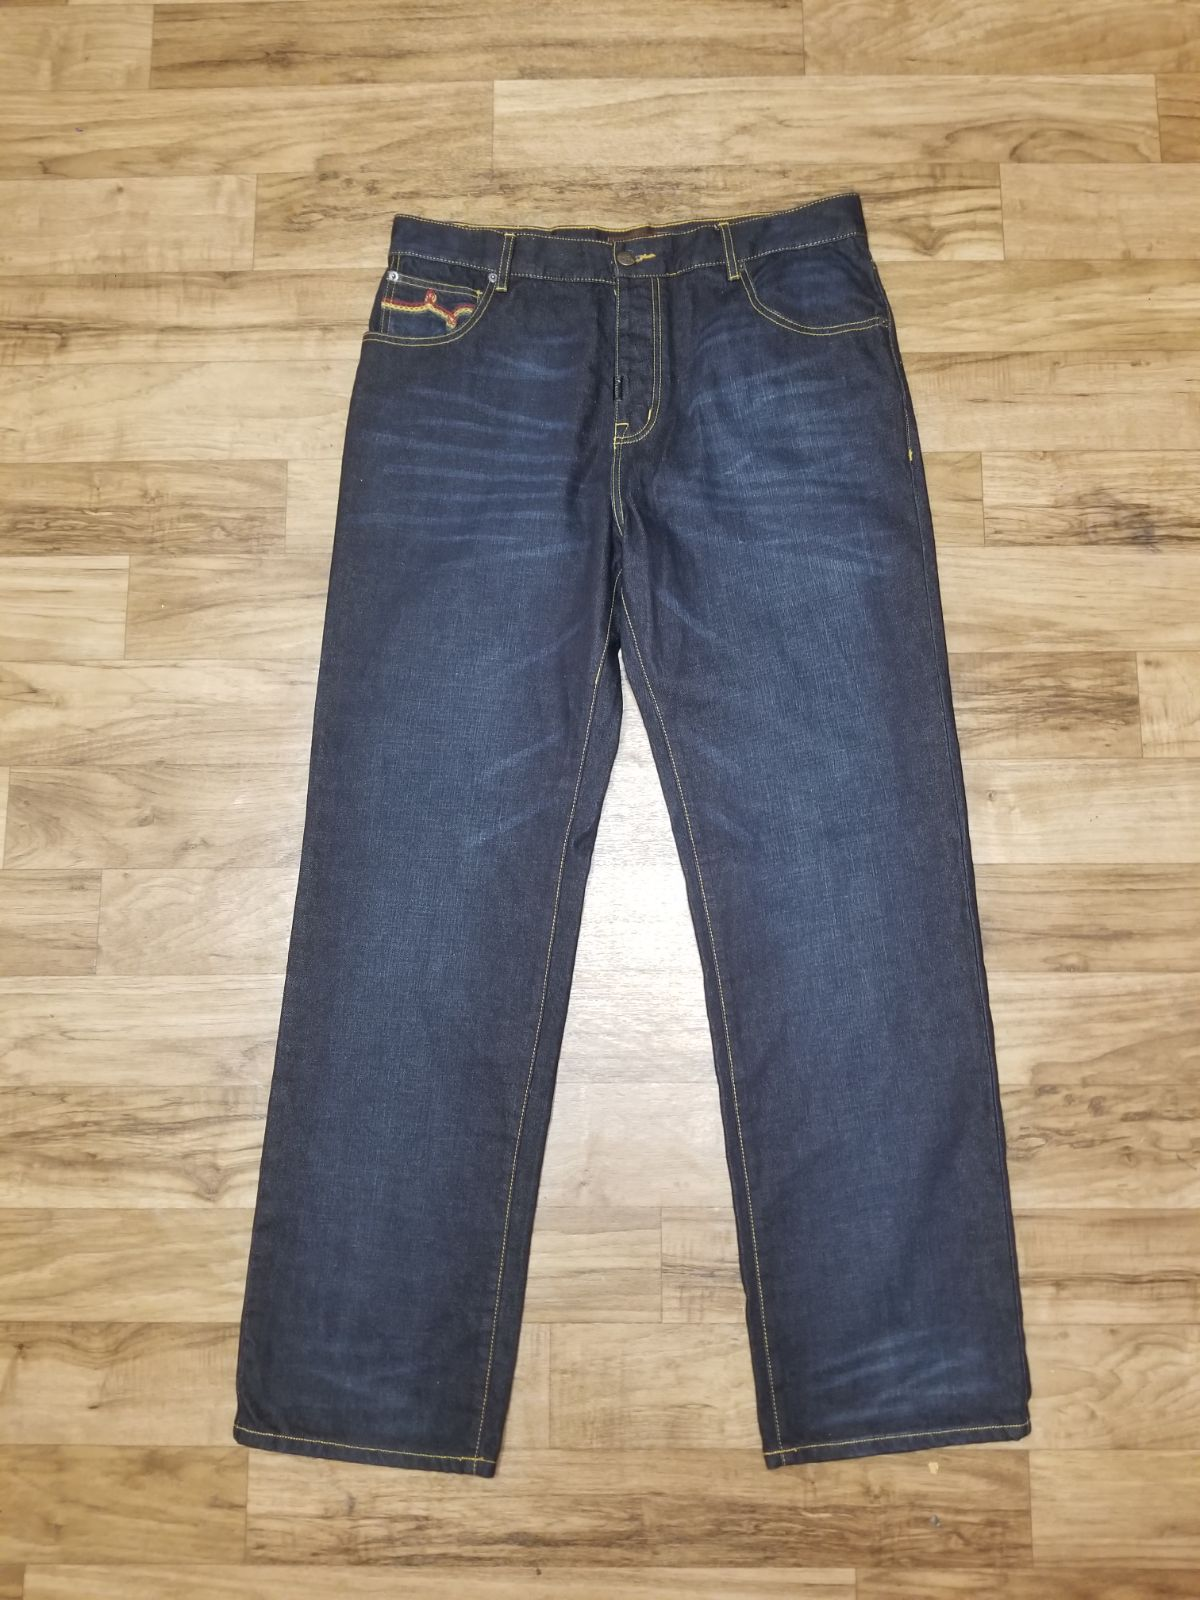 Vintage LRG Denim jeans /Sz 36